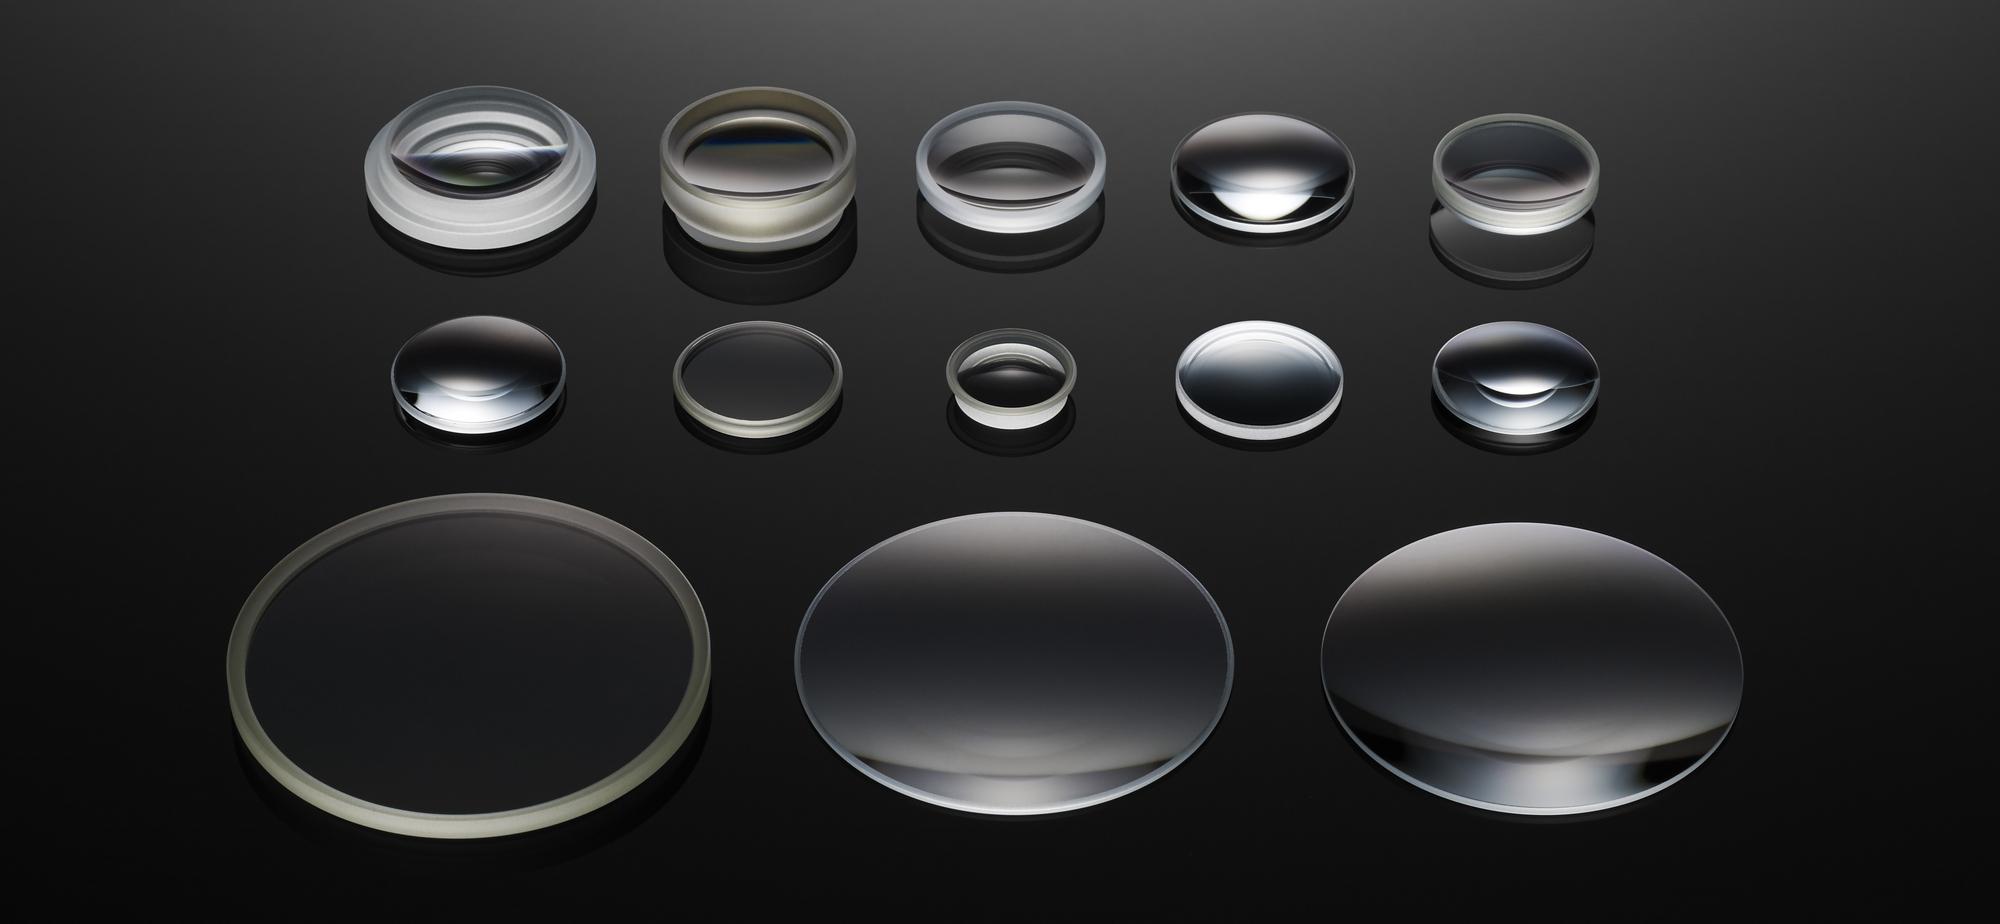 RX10 III_lens_all.jpg